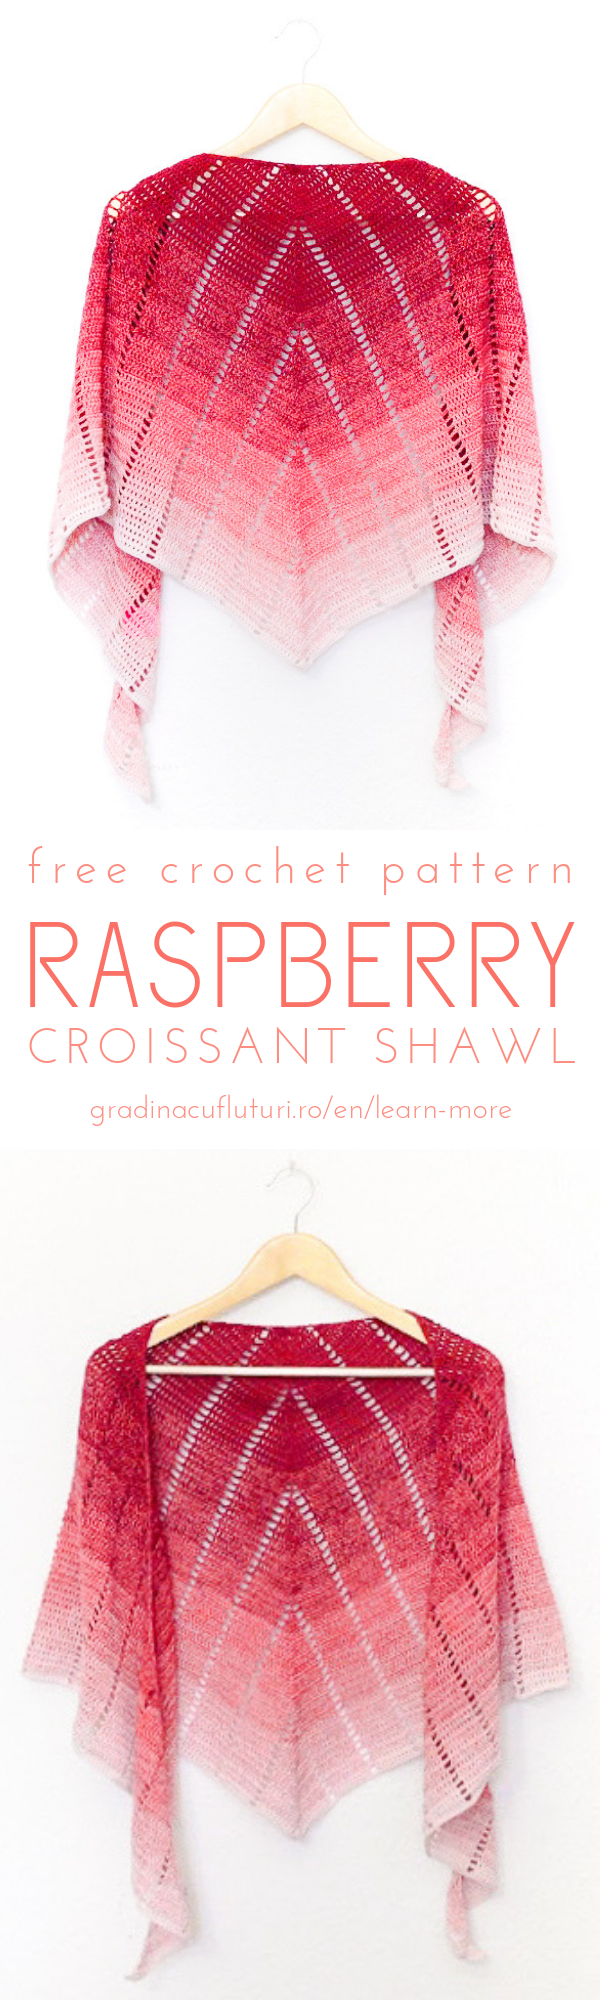 Raspberry croissant free crochet pattern - Andrea Cretu